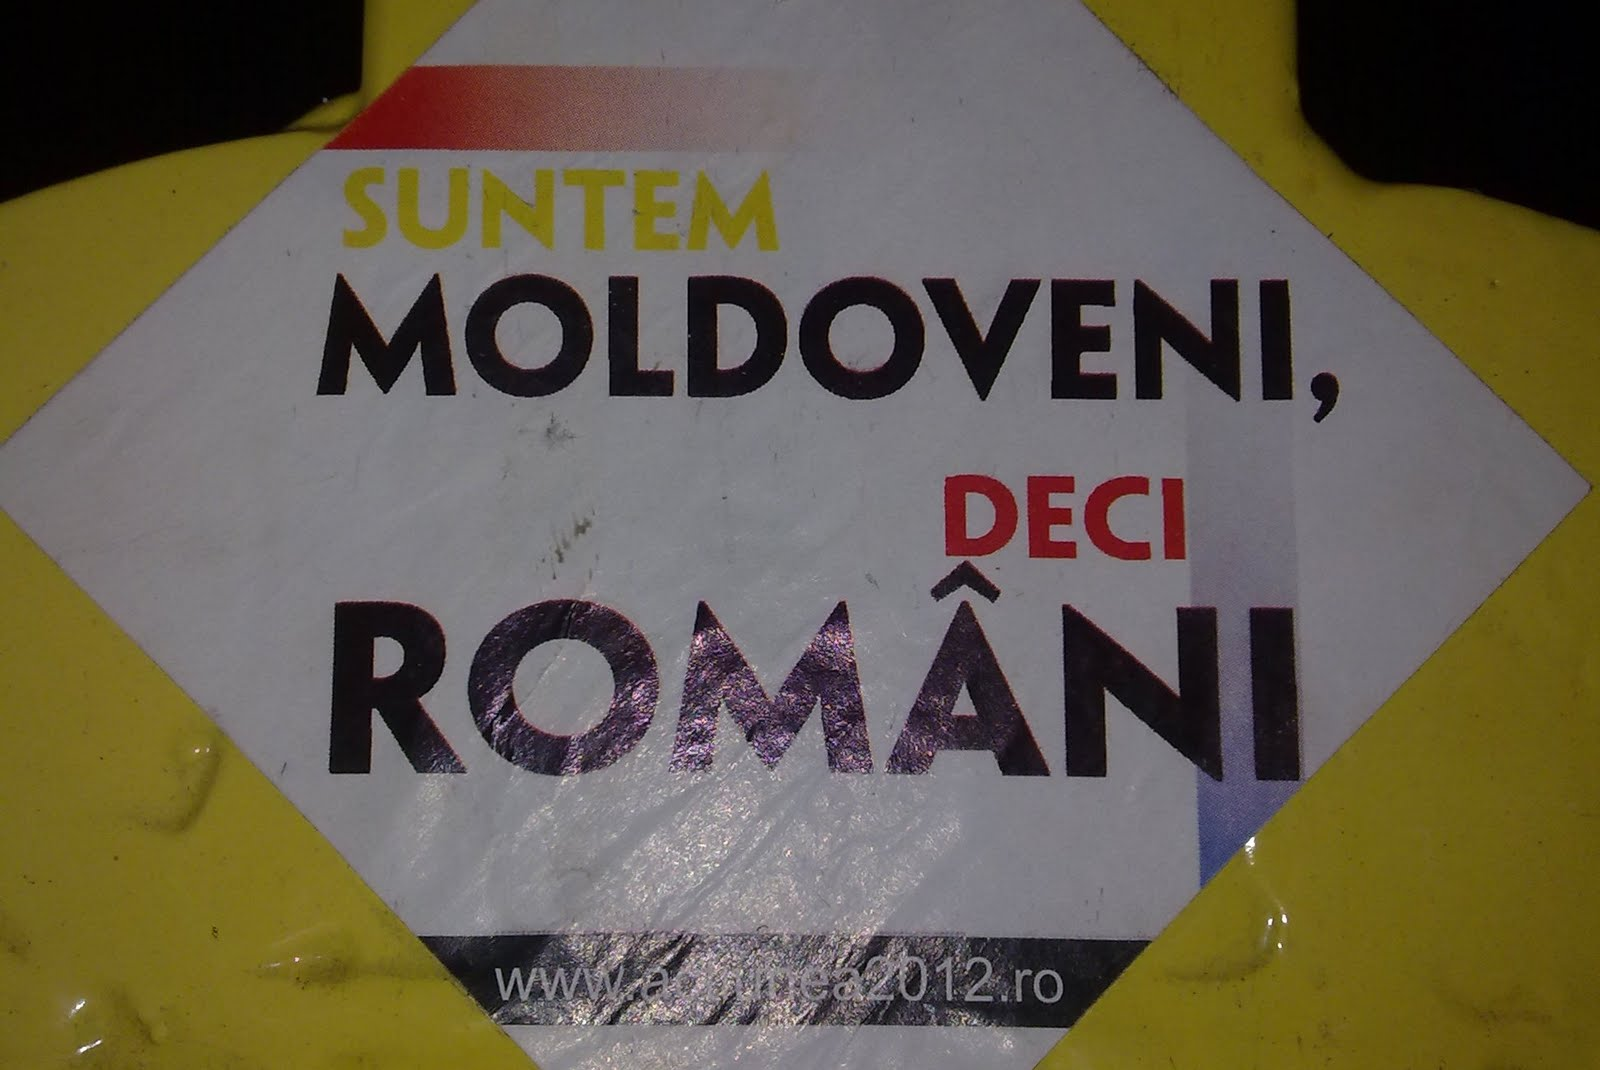 """SUNTEM MOLDOVENI, DECI ROMÂNI"""